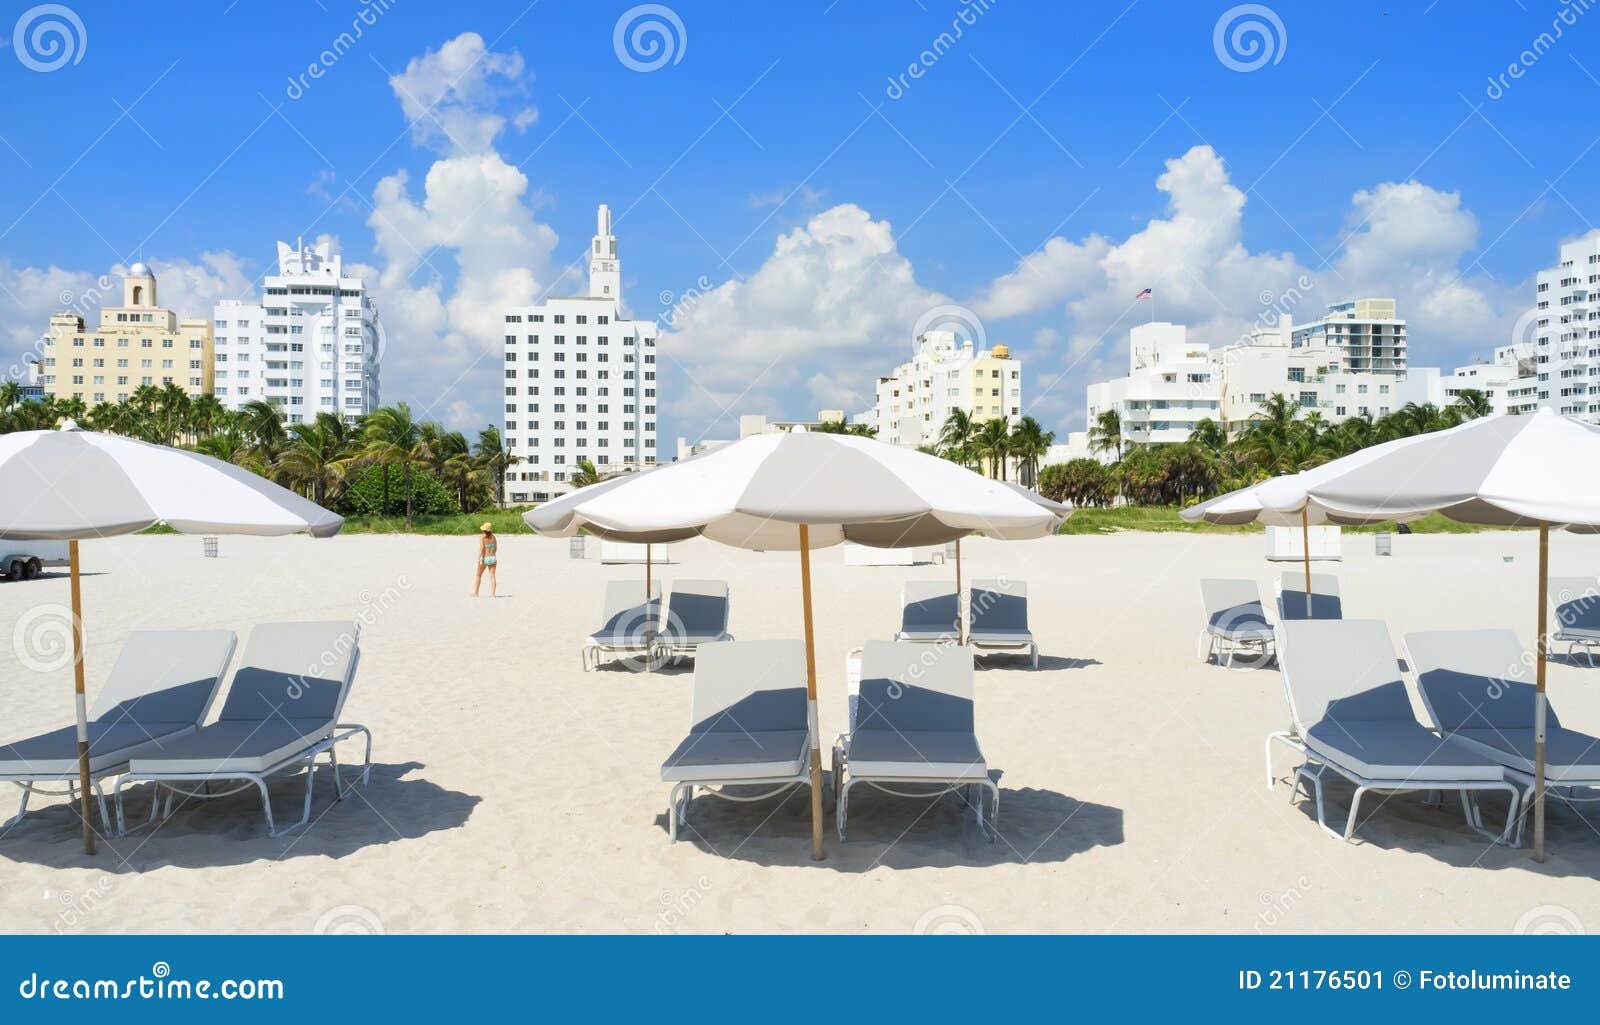 art beach colorful deco lounge - Beach Lounge Chairs